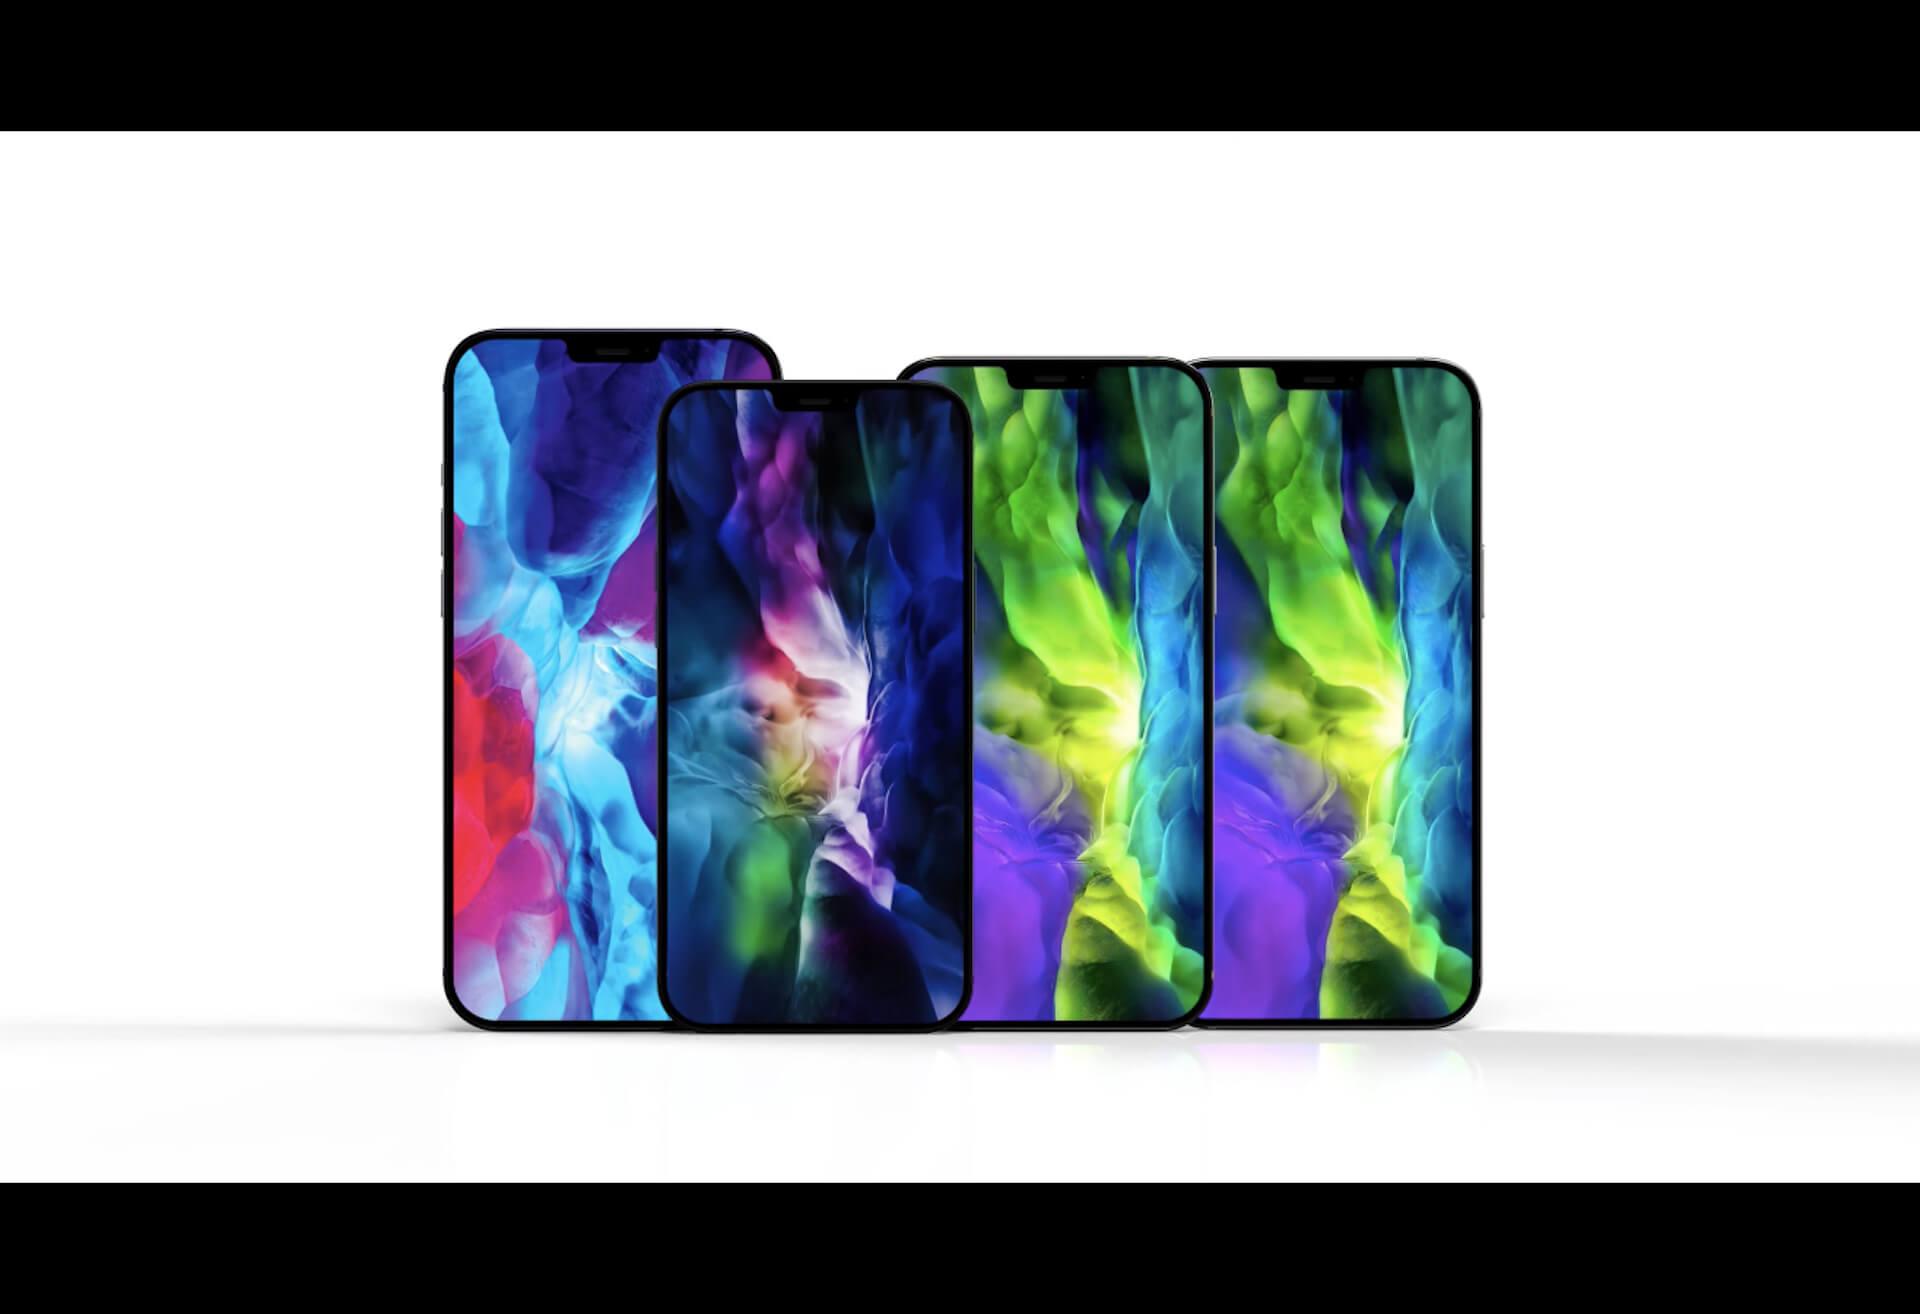 OLEDディスプレイ搭載のiPhone 12の価格帯は600ドル〜700ドルに? tech200427_iphone12_main